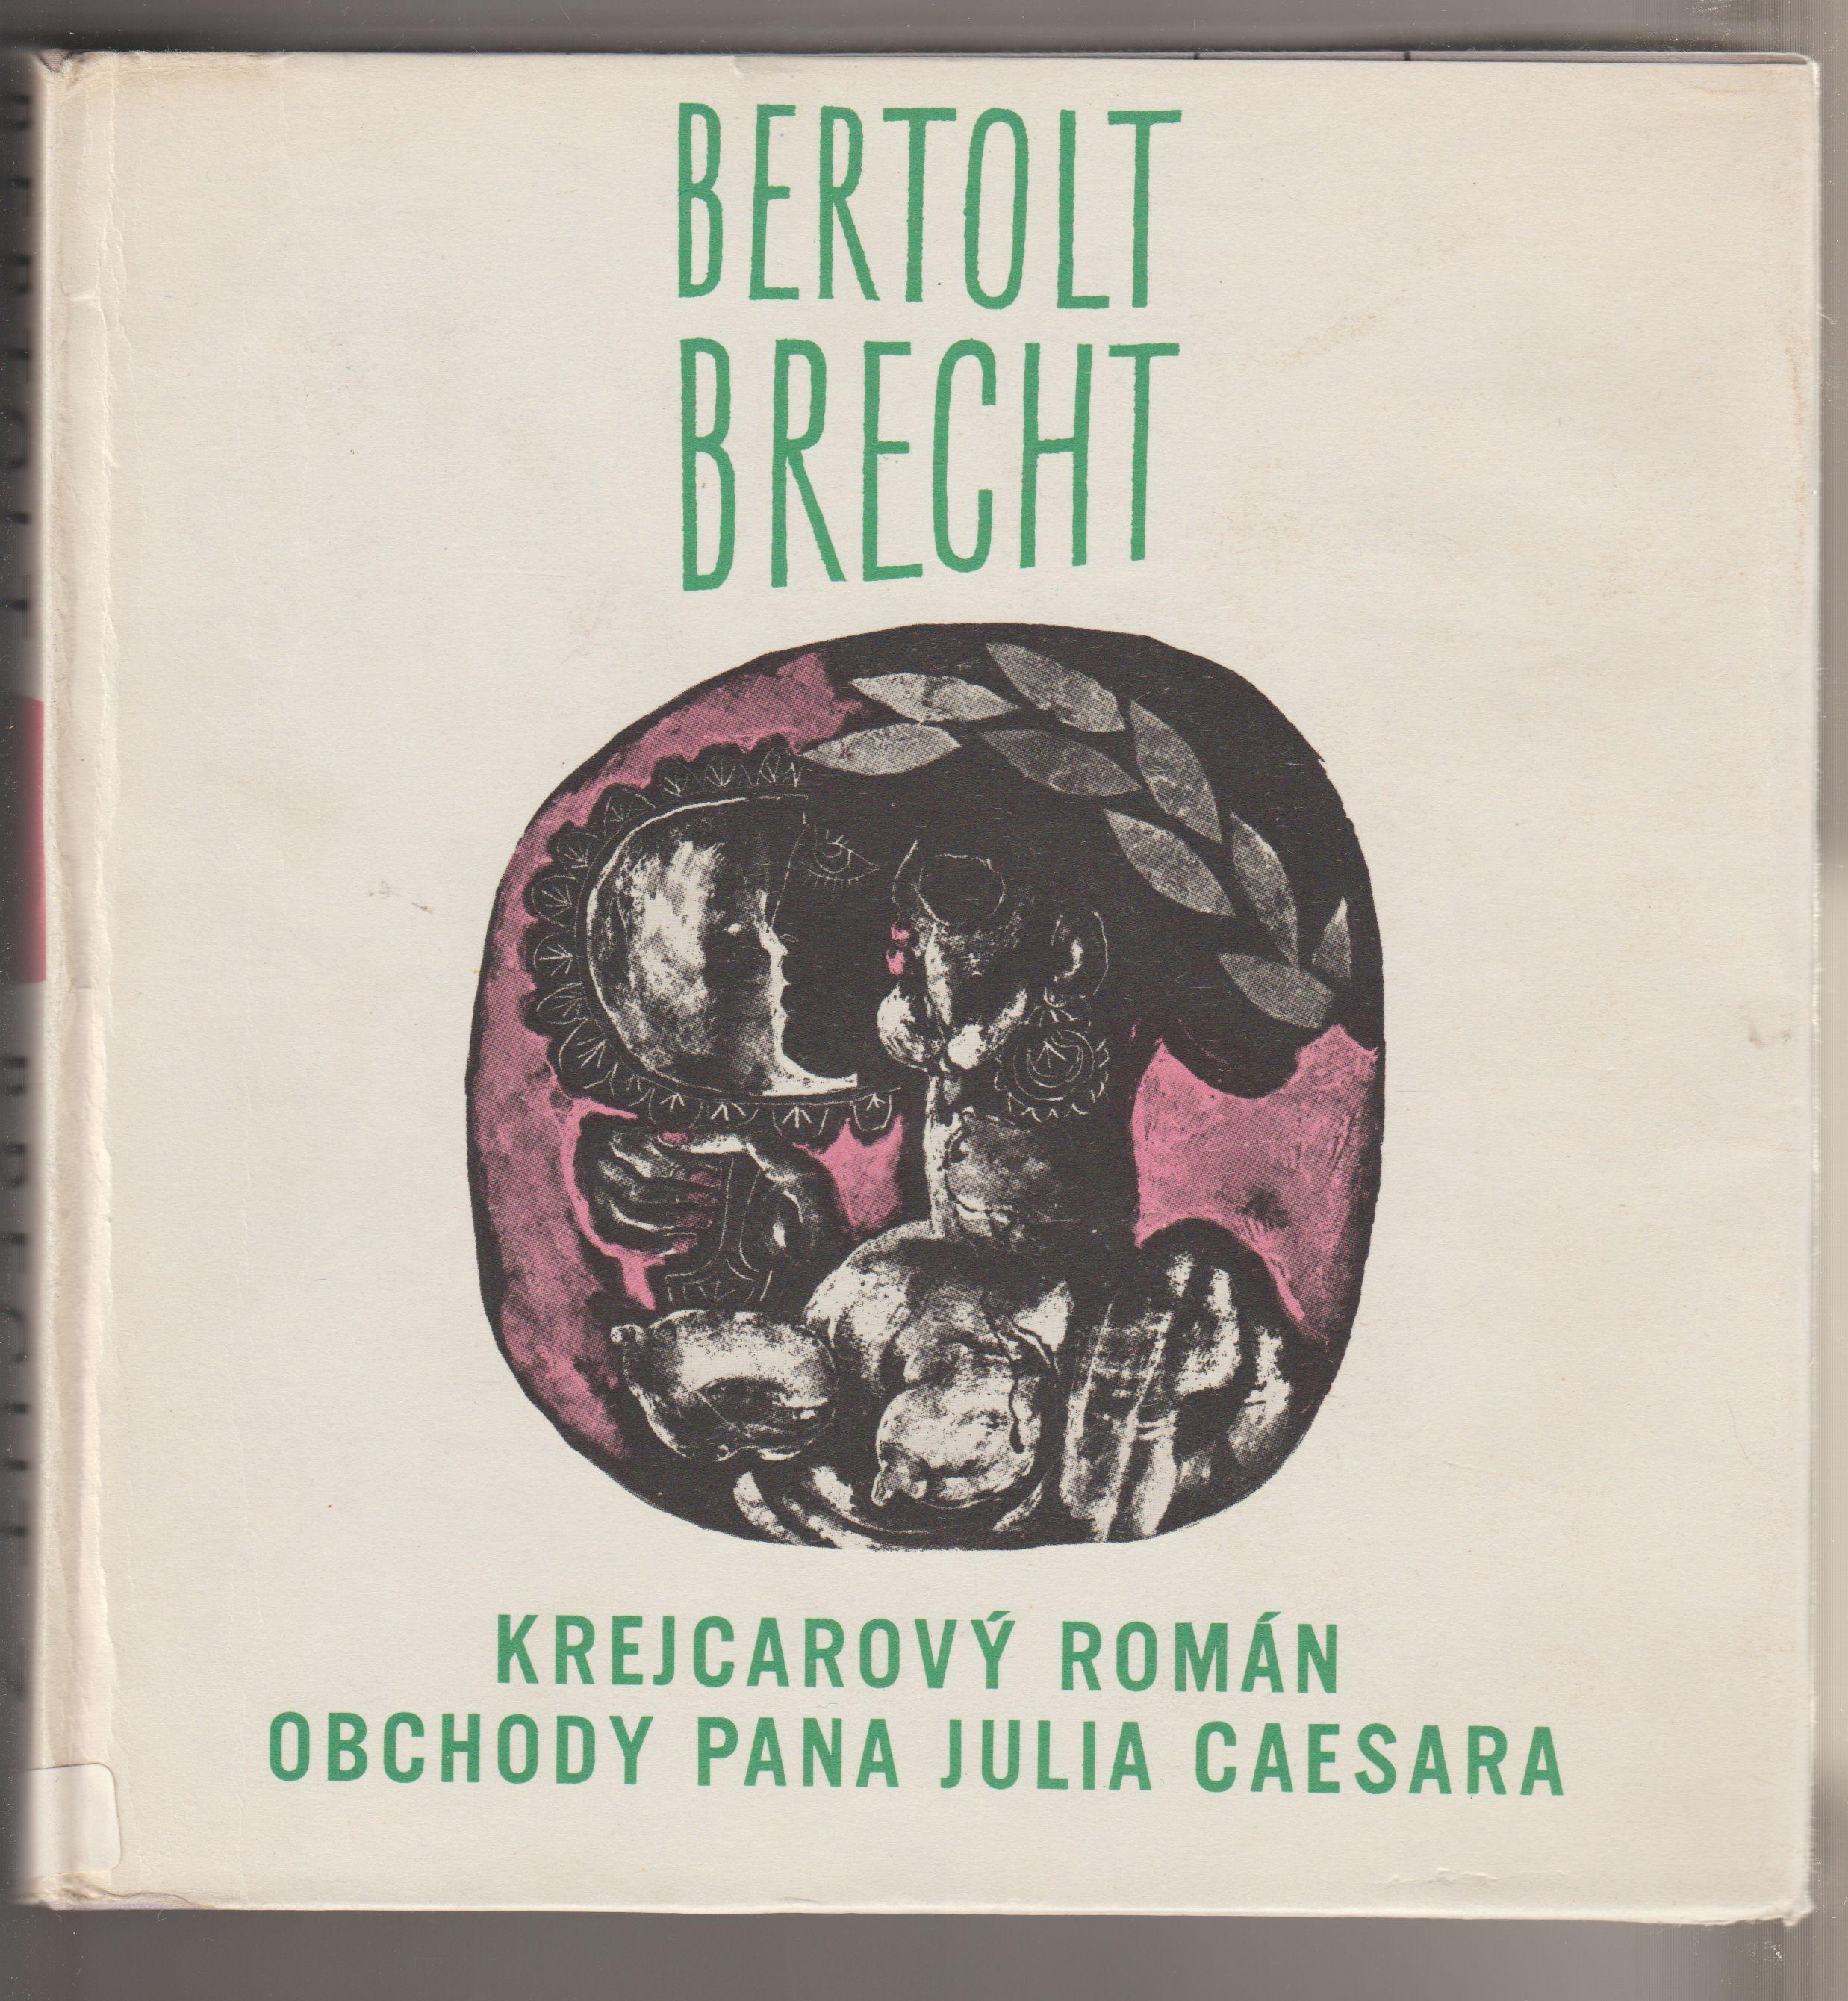 Obchody pana Julia Caesara - Bertolt Brecht